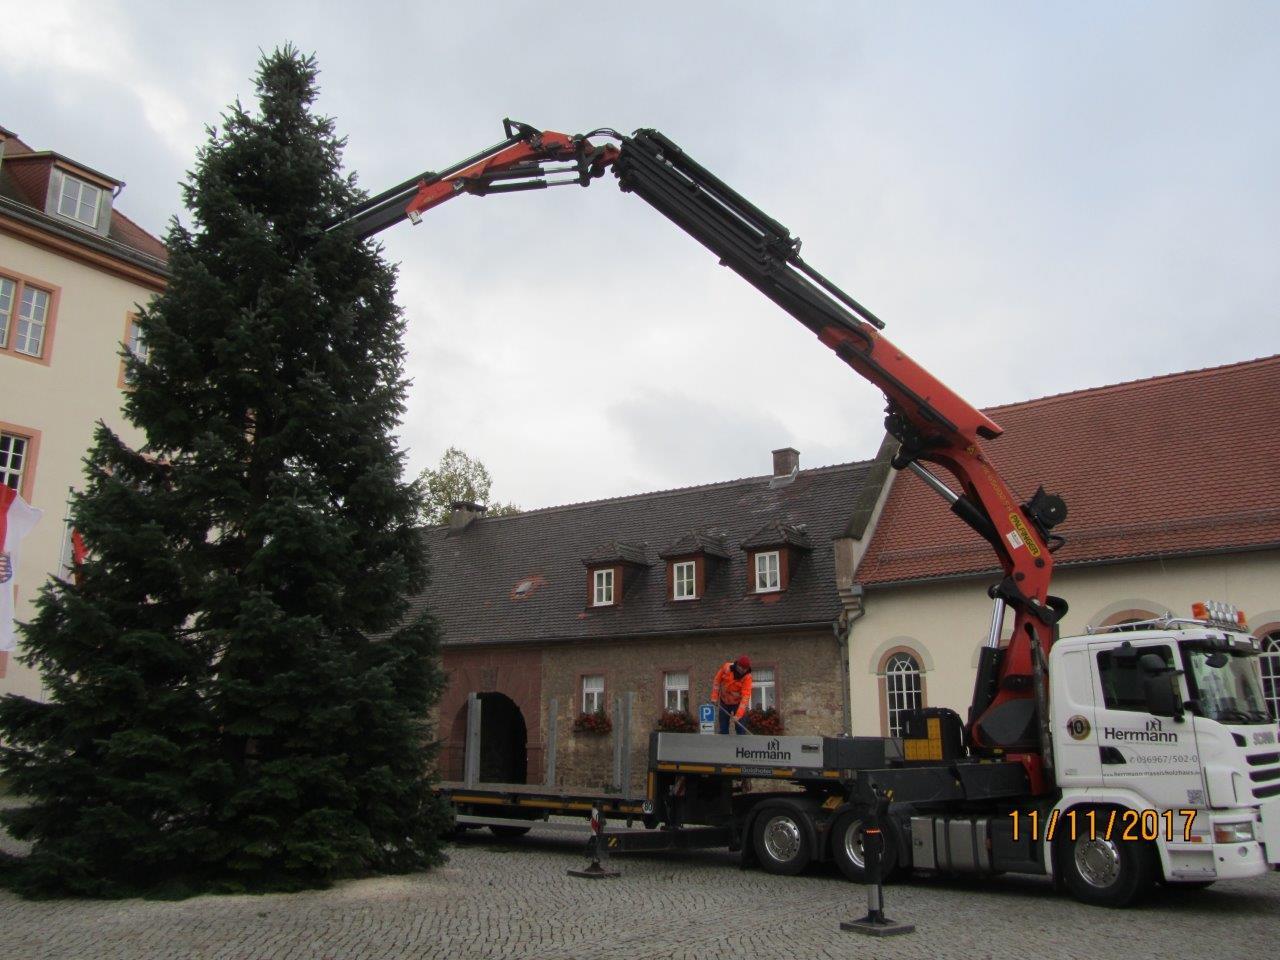 Herrmann Massivholzhaus größter weihnachtsbaum schmückt marktplatz